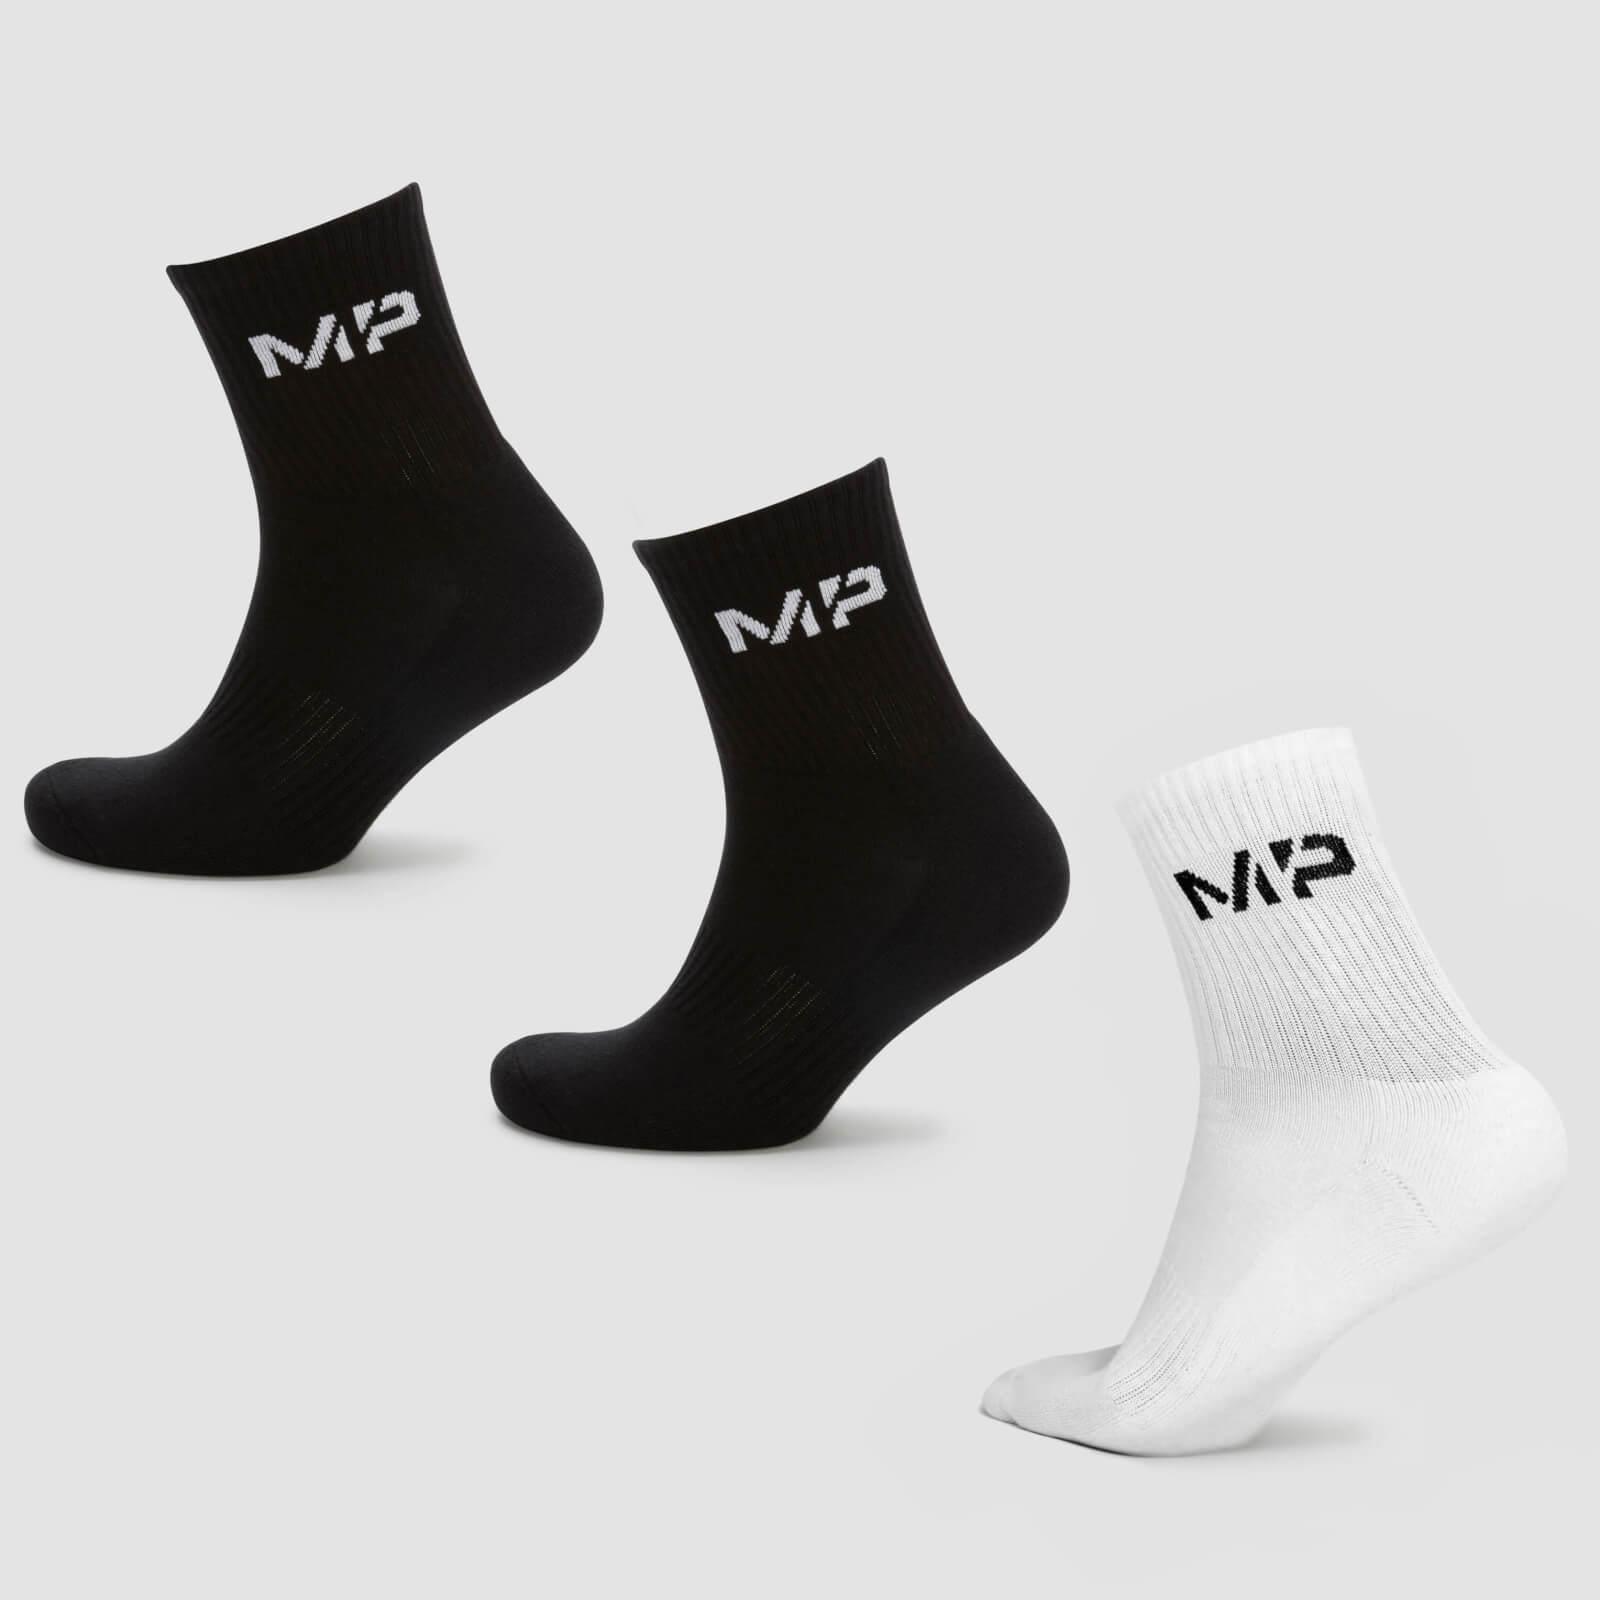 Купить MP Women's Crew Socks - Black/White (3 Pack) - UK 3-6, Myprotein International